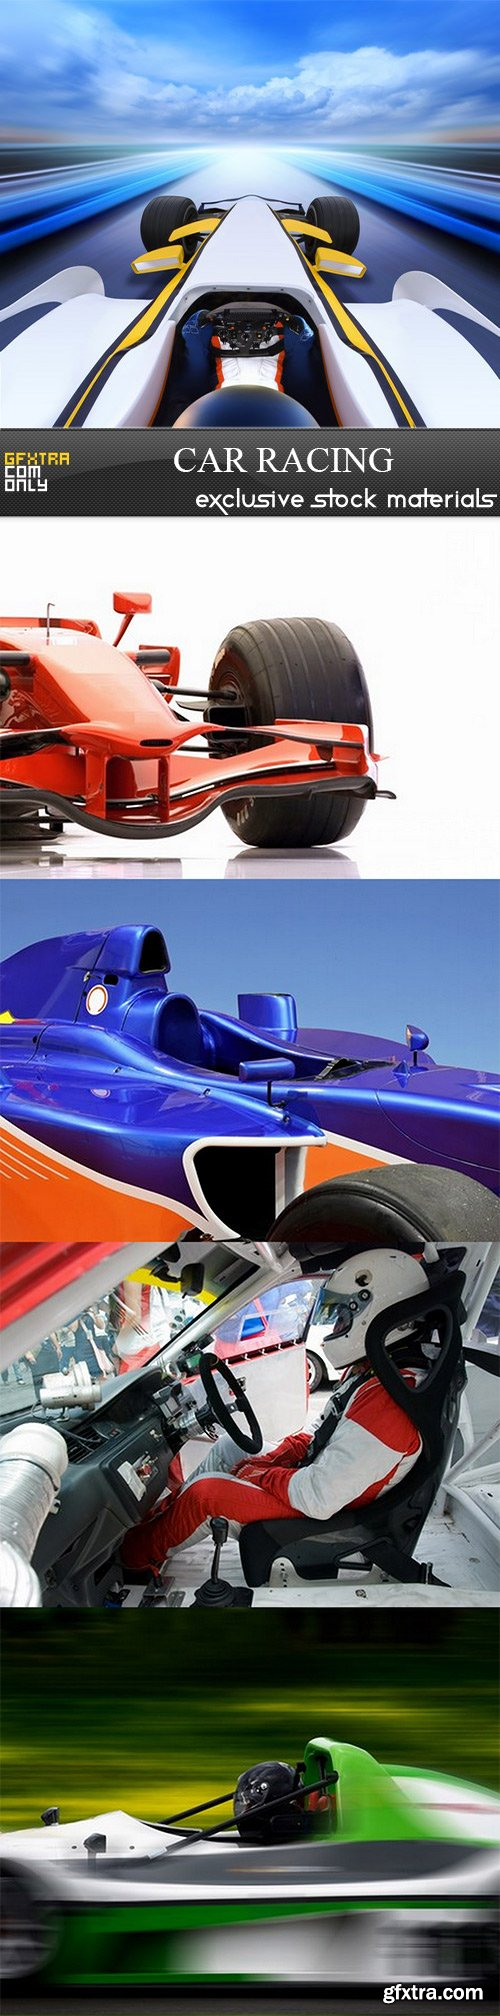 Car Racing - 5 UHQ JPEG